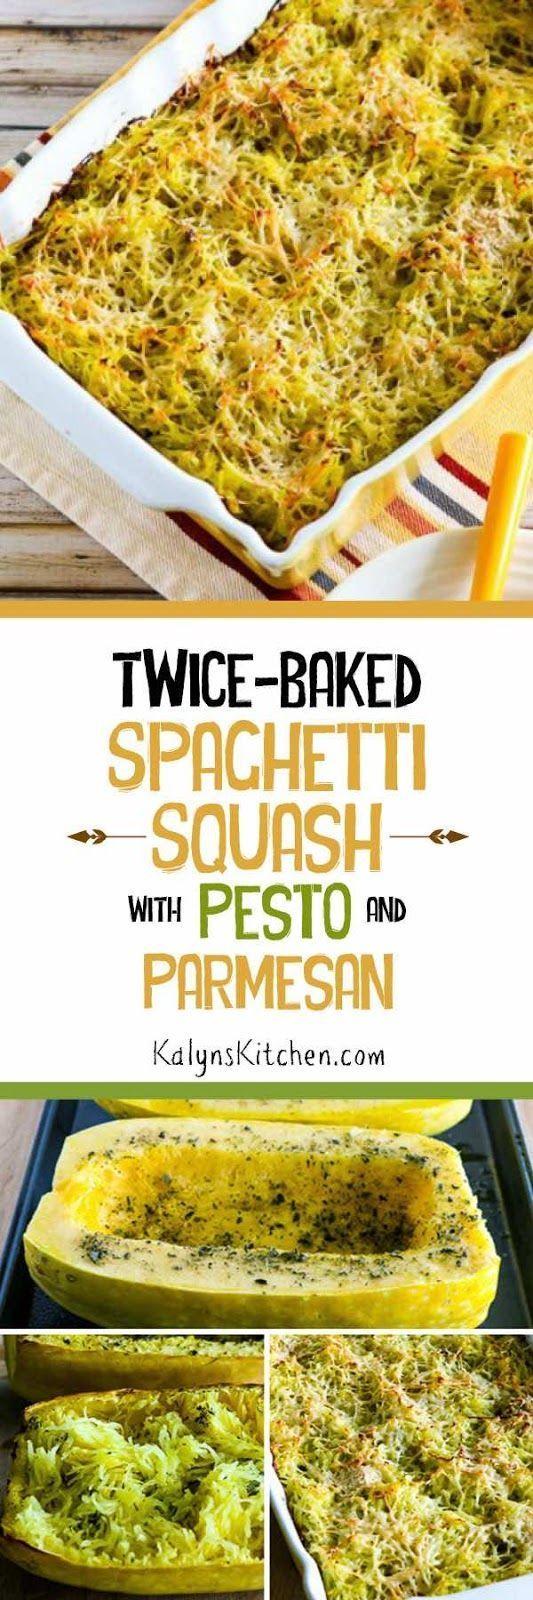 Twice-Baked Spaghetti Squash Recipe with Pesto and Parmesan found on KalynsKitchen.com